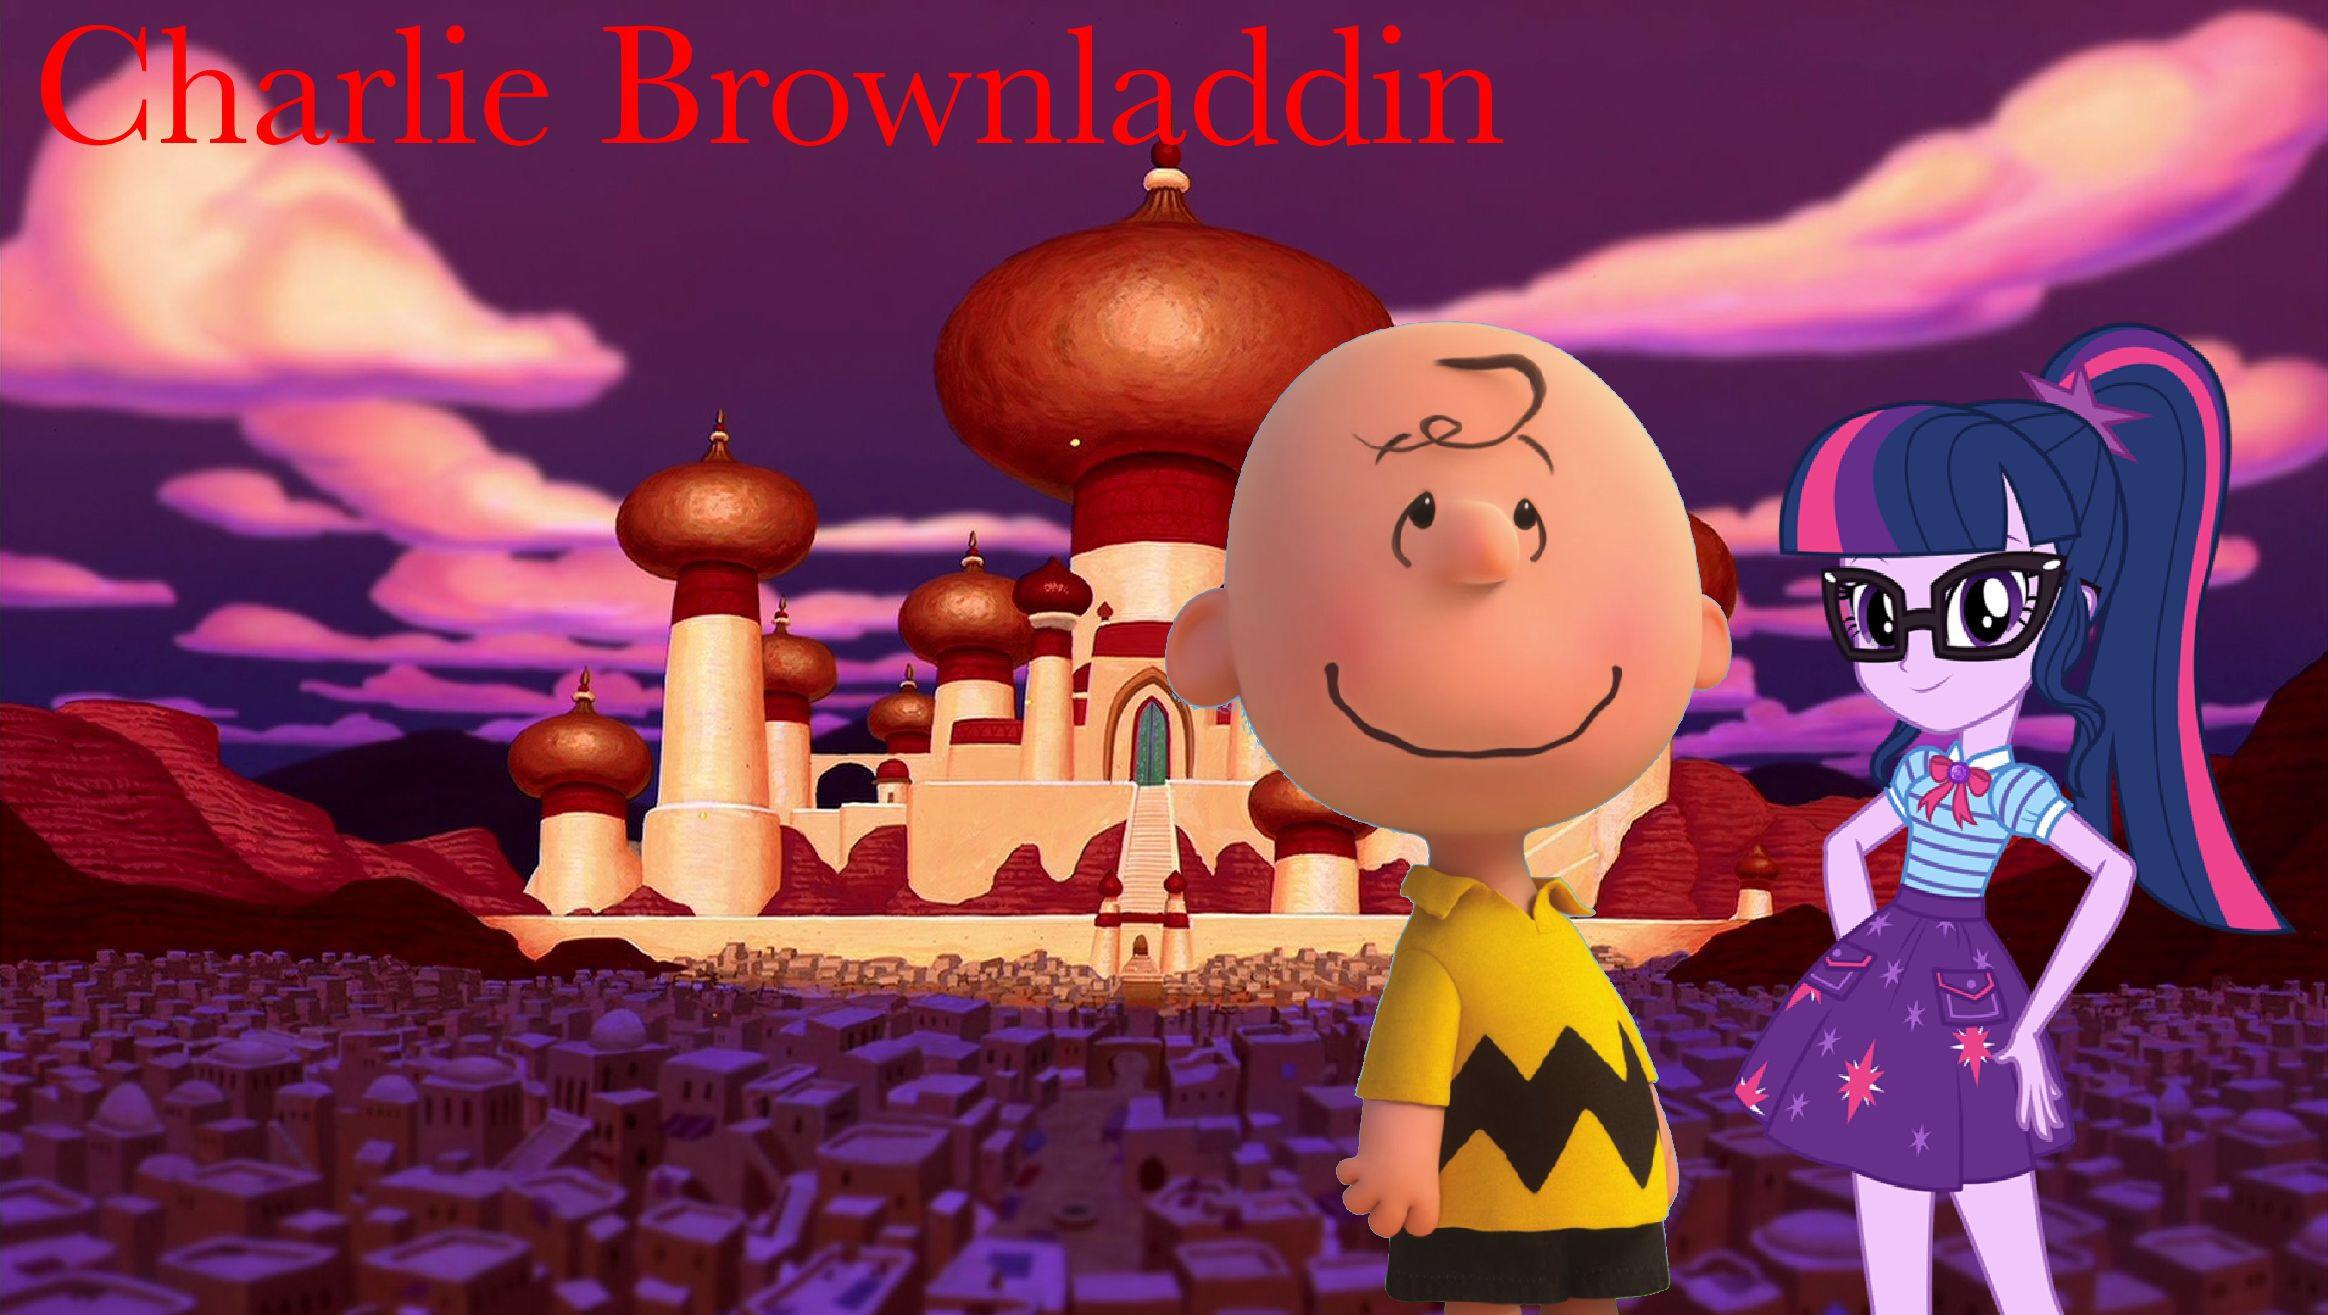 Charlie Brownladdin